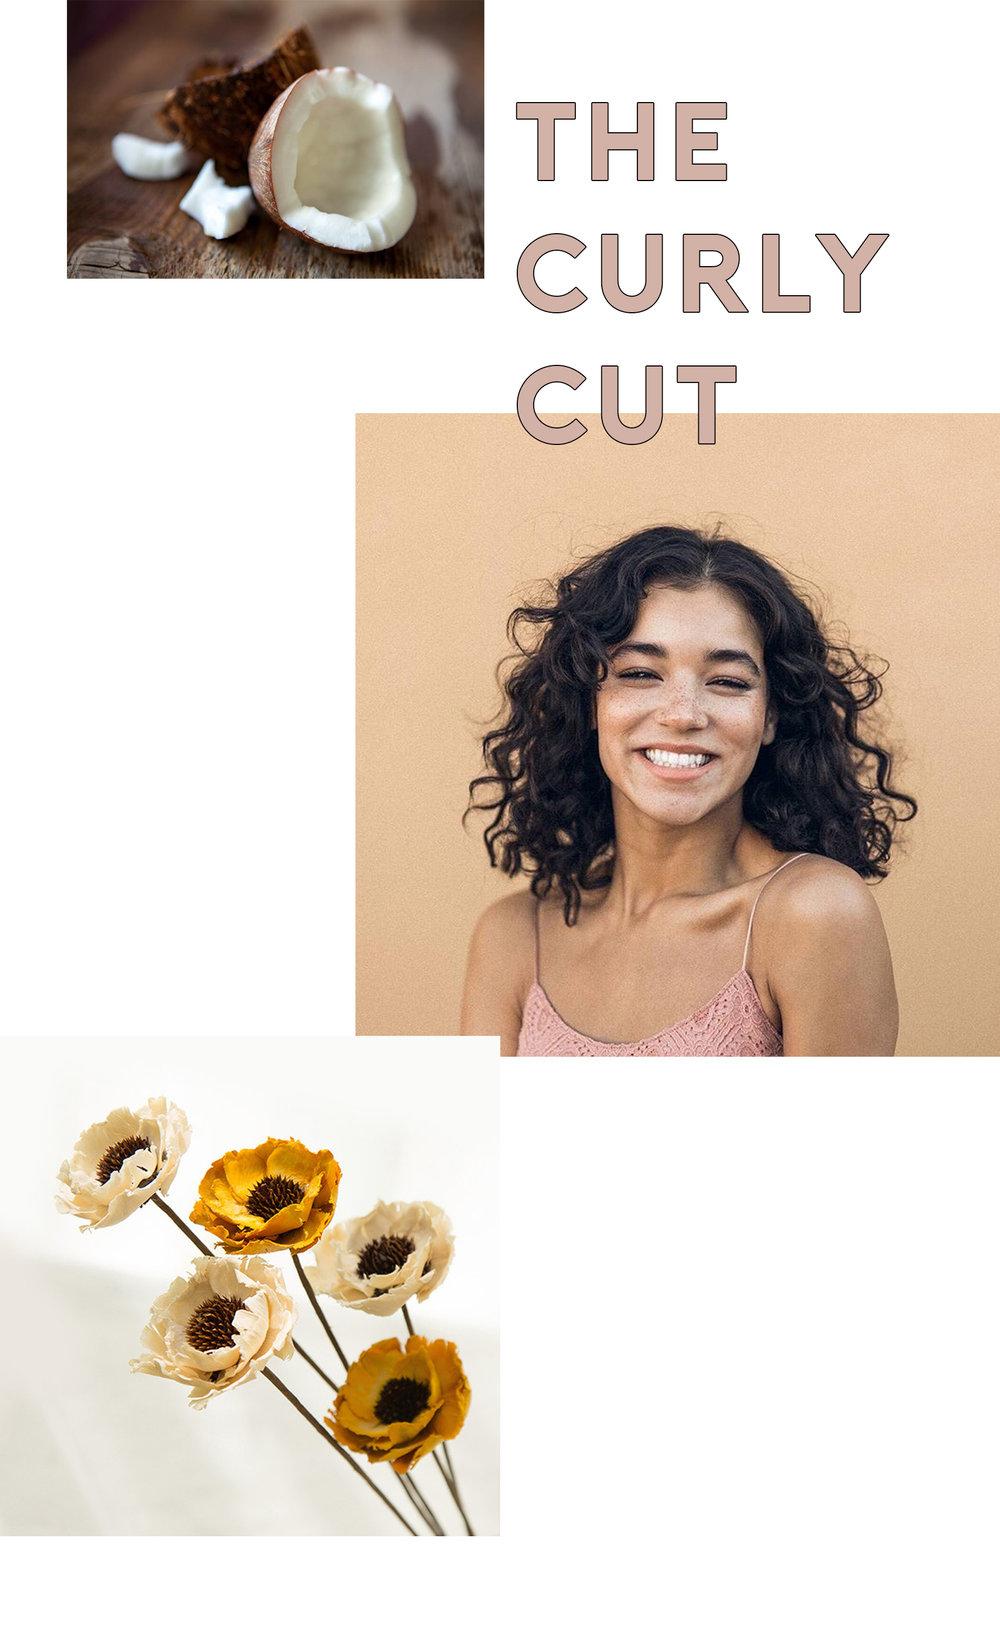 thecurlycut2.jpg